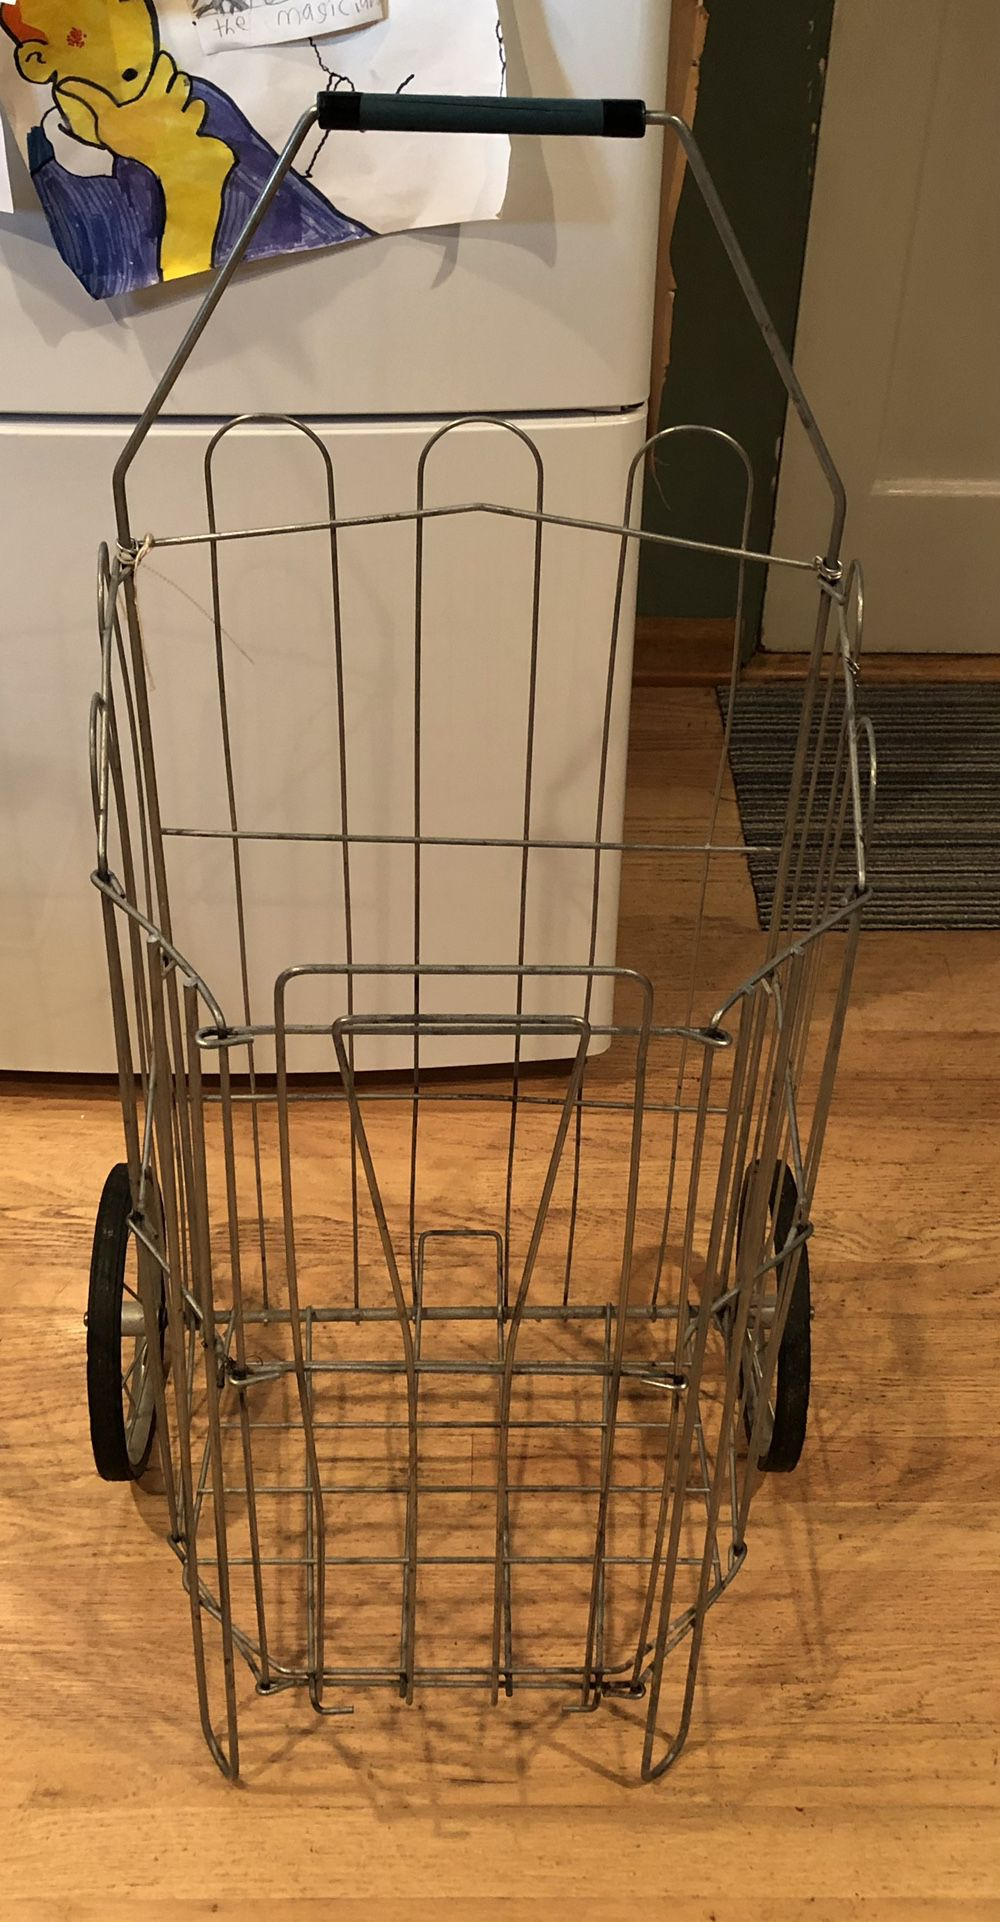 Vintage Grocery Cart With Postal Liner